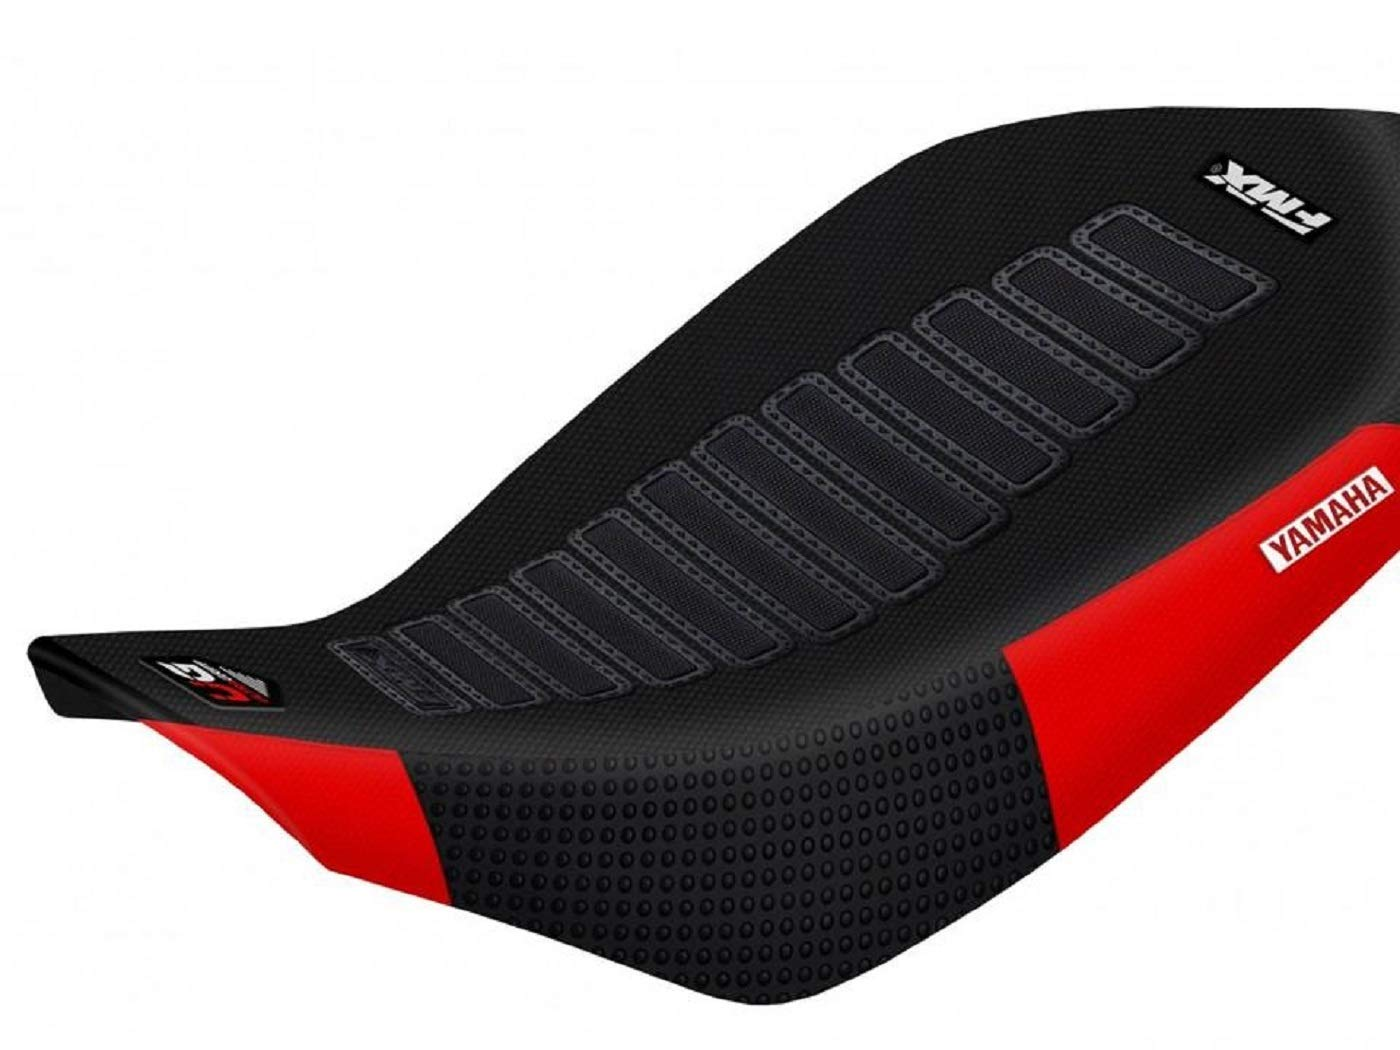 SEAT COVER YAMAHA RAPTOR 700 ULTRA GRIPP BLACK - RED